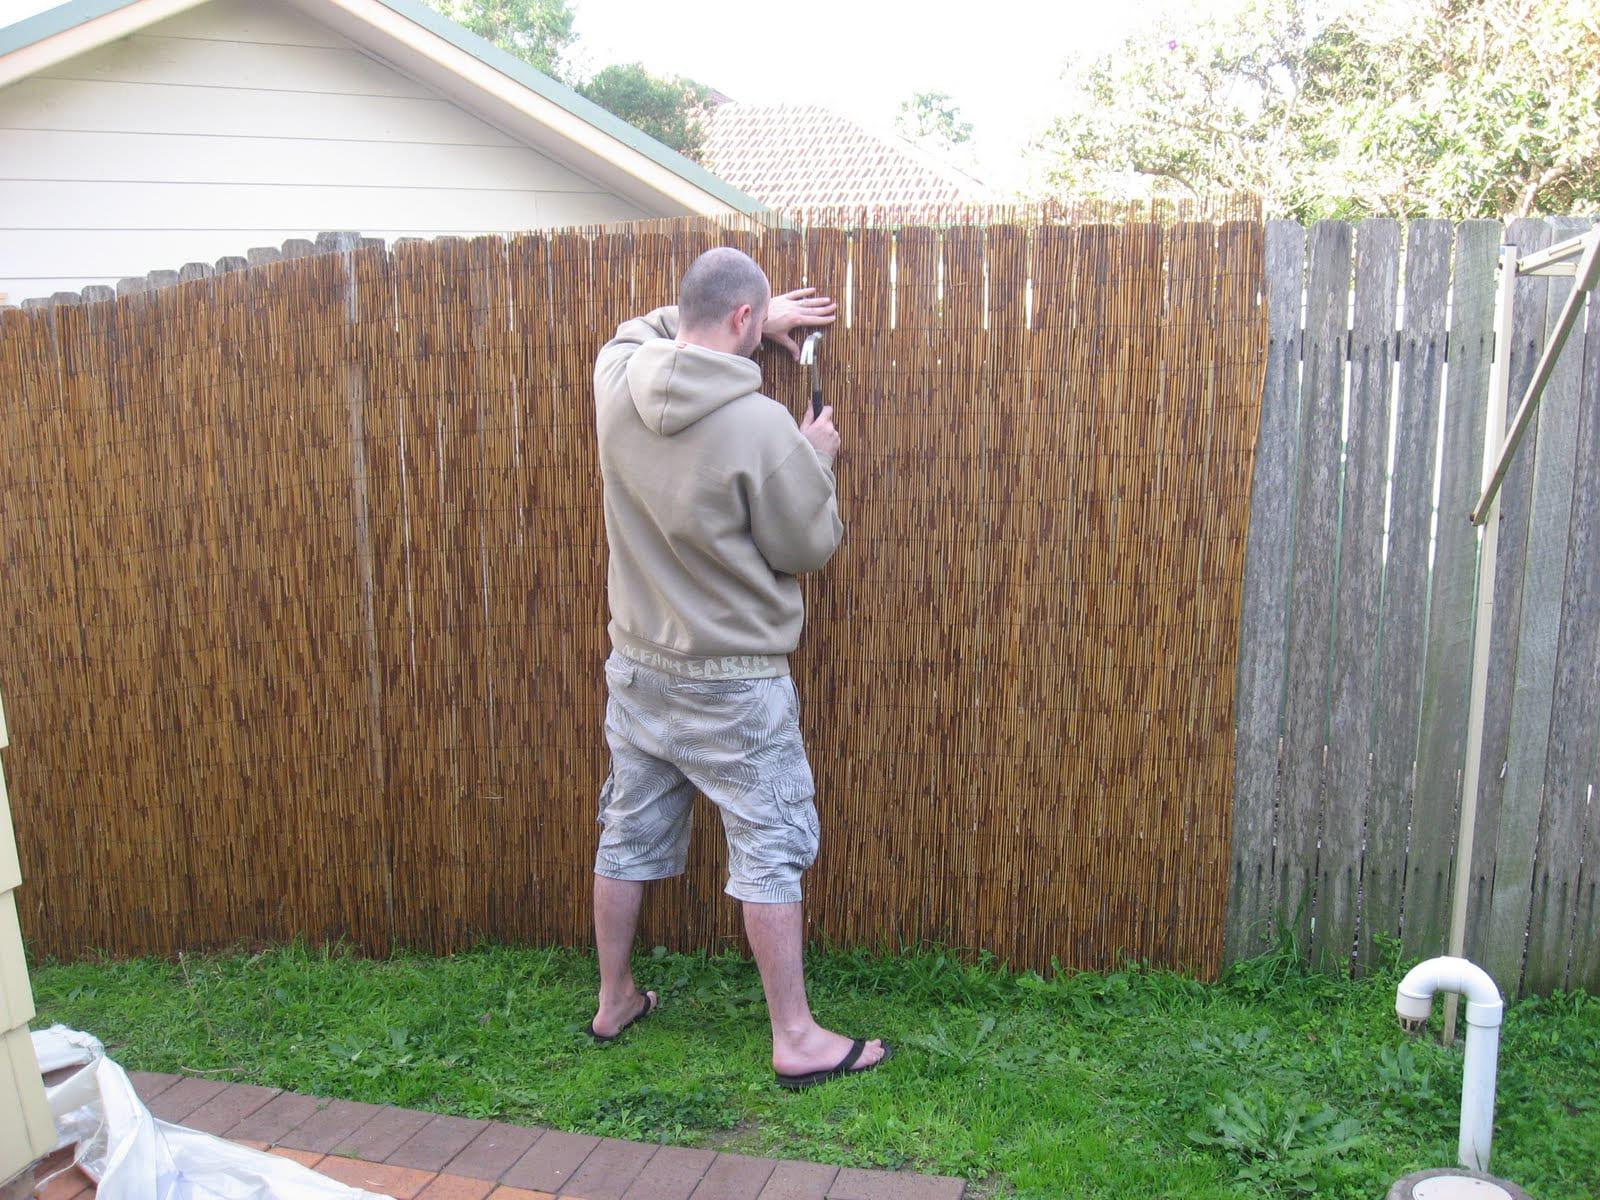 Simphome.com privacy fence ideas for backyard and terrace ducksdailyblog fence for cheap backyard fence ideas